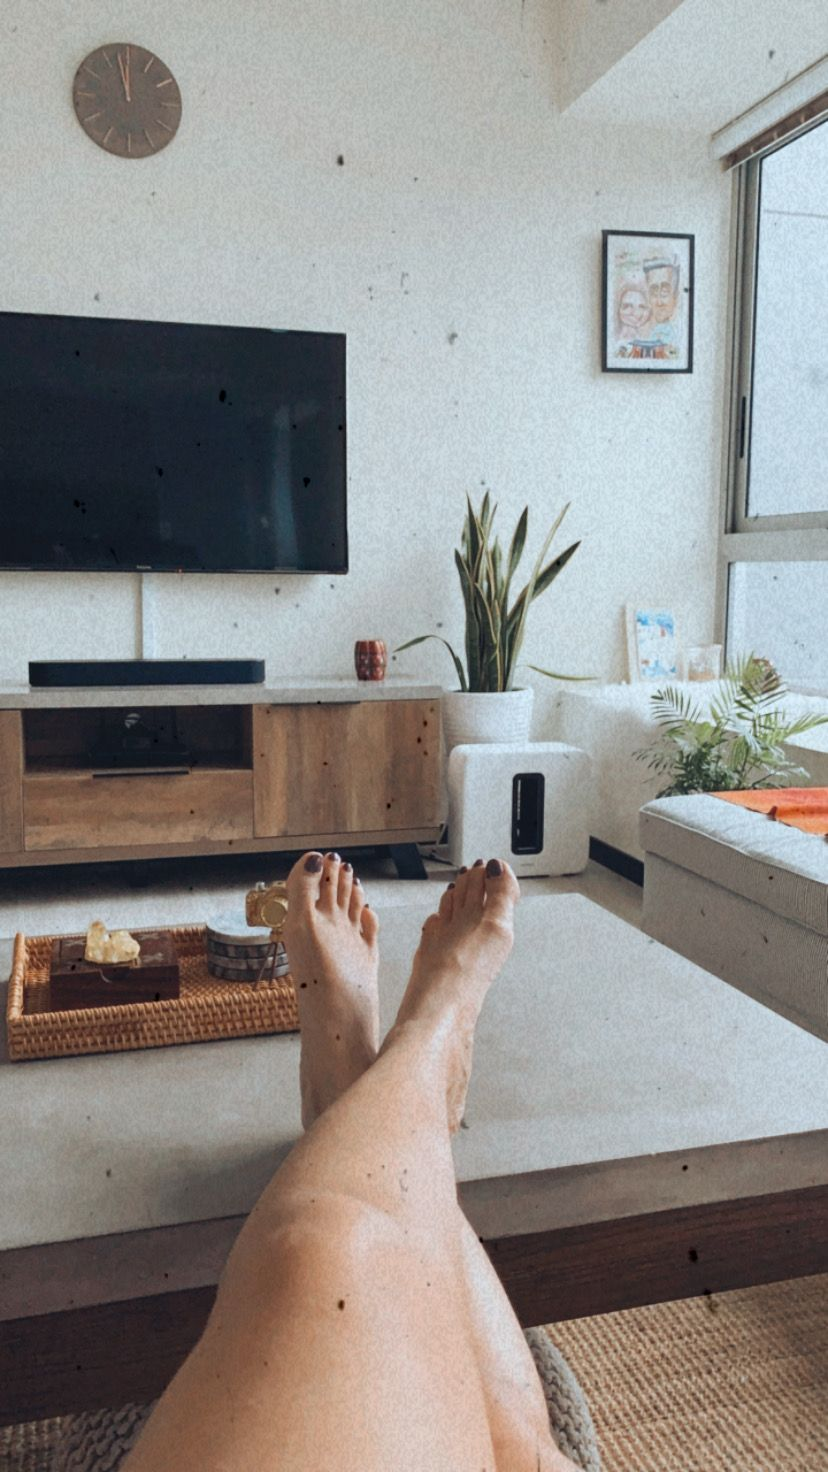 Minimal decor with plants instantly add a good vibe to the space! #goodvibes #minimalist #minimaldecor #bohemian #plants #houseplants #mood #positivethoughts #lifestyle #livingroom #interior #monday